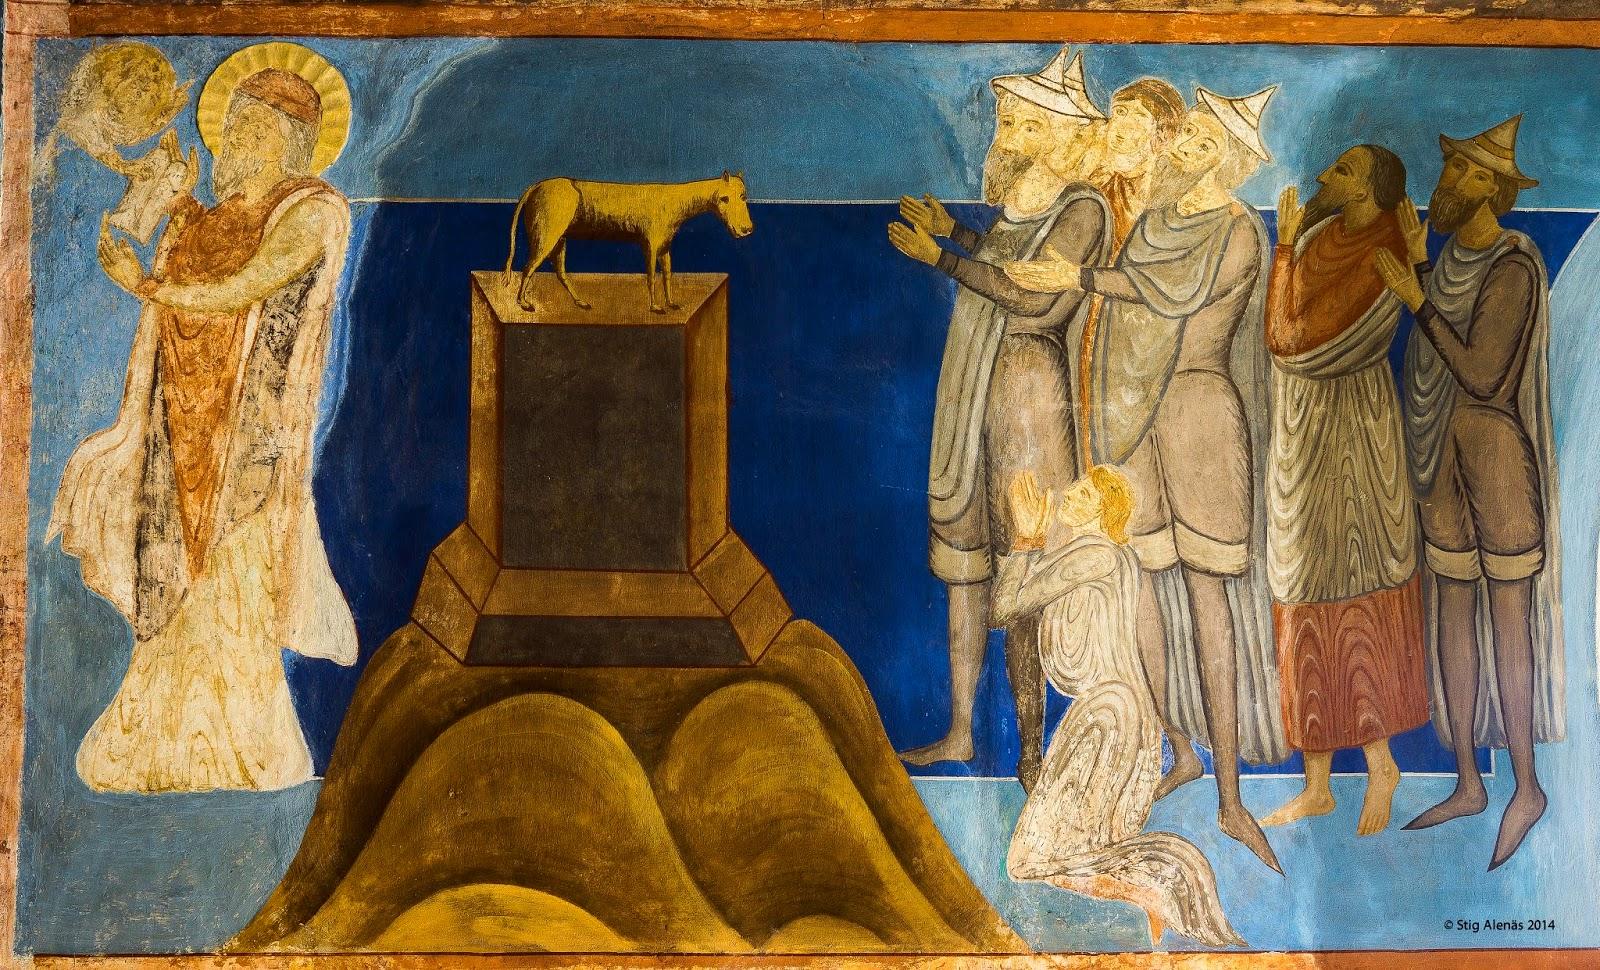 church, stucco, interior, christ, ultramarine, fresco, illustrative, religion, commandments, halo, angel, moses, apostles, sweden, romanescue, bjaresjo